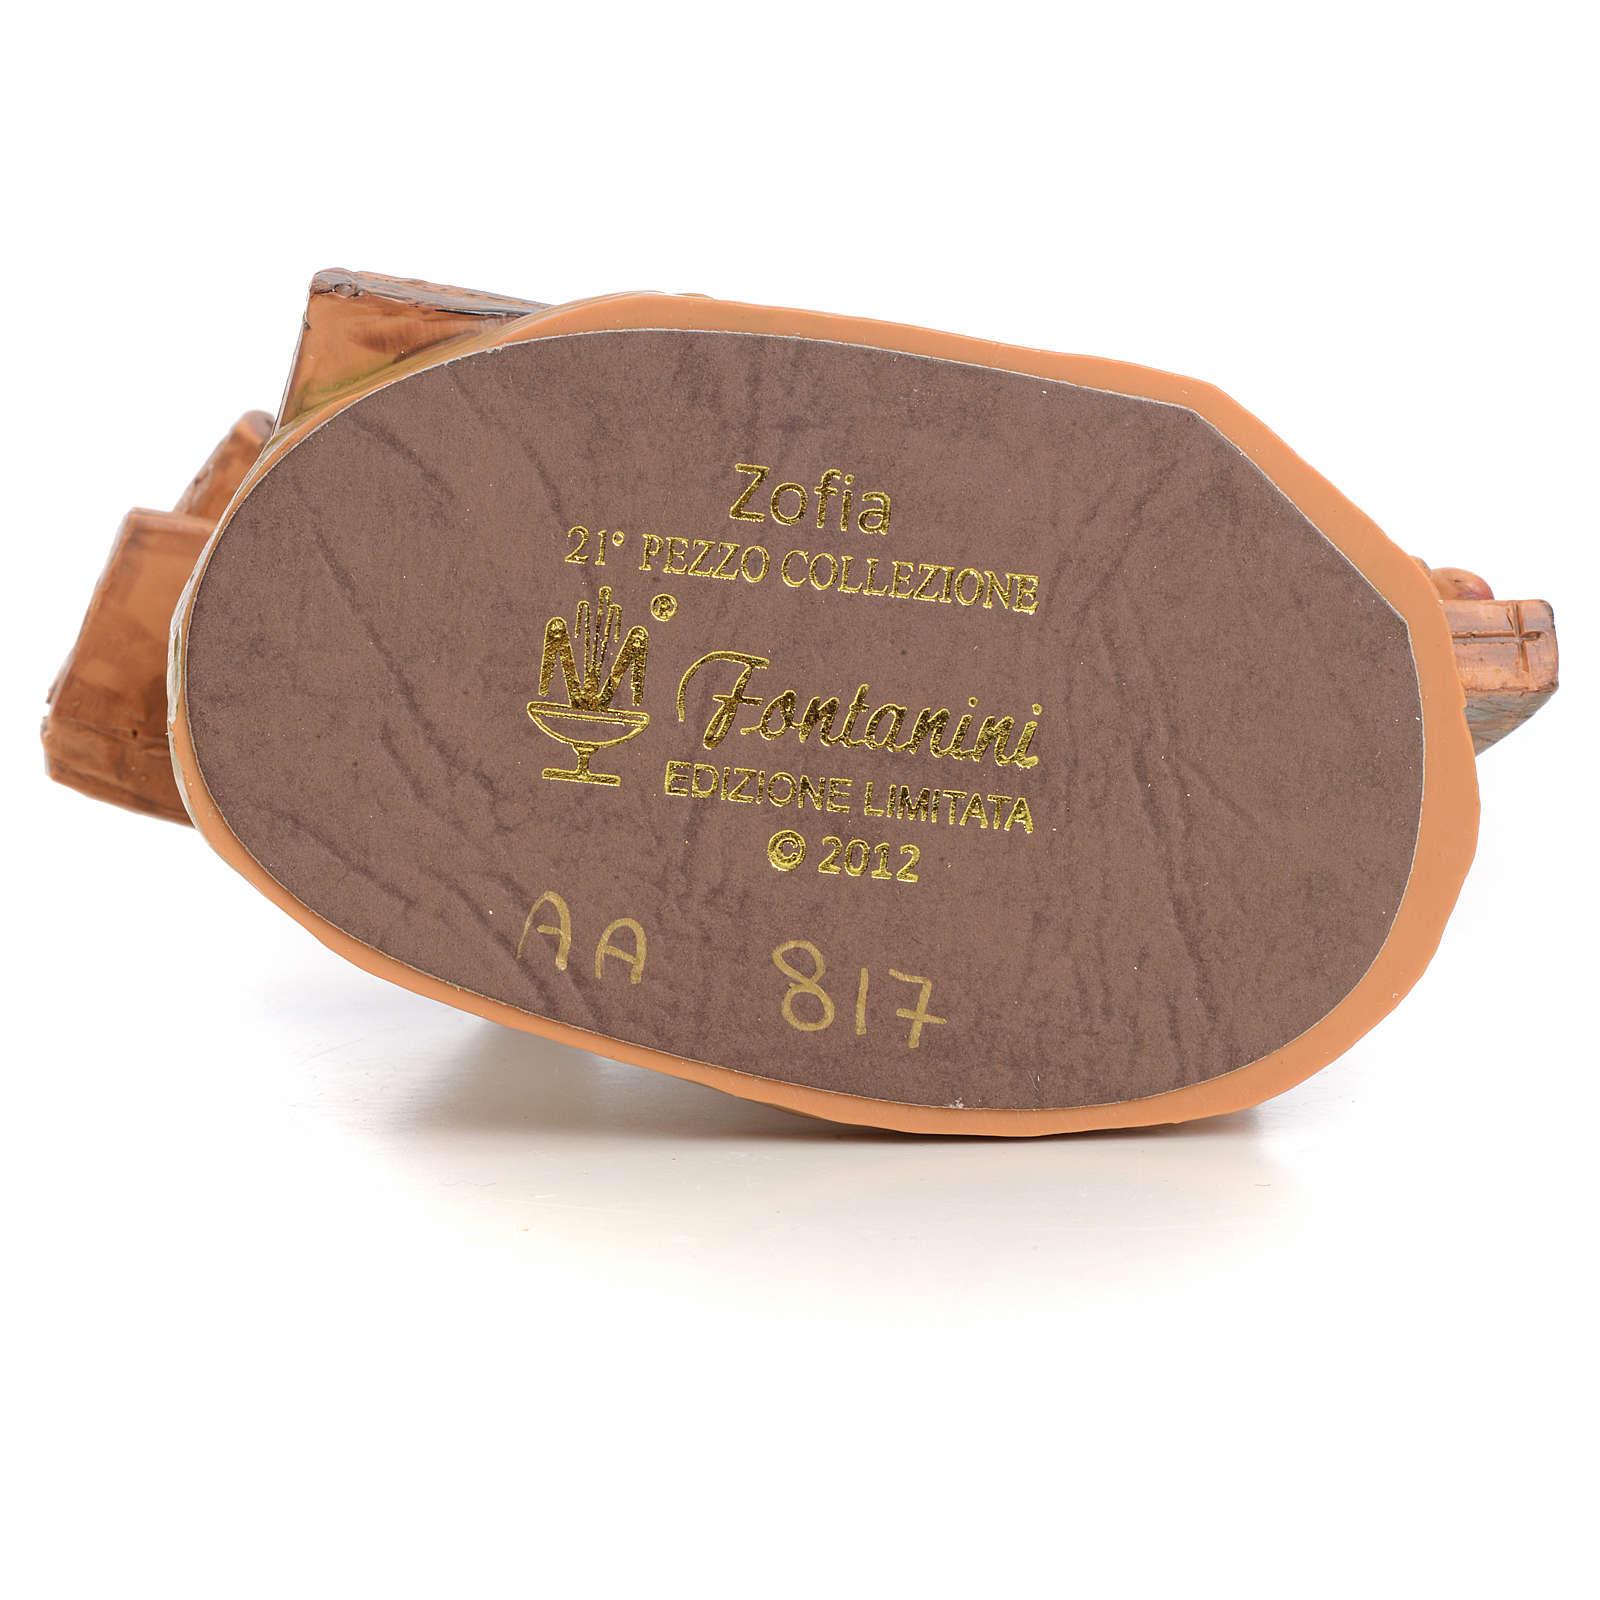 Zofia 12cm Fontanini E. limitada año 2012 3